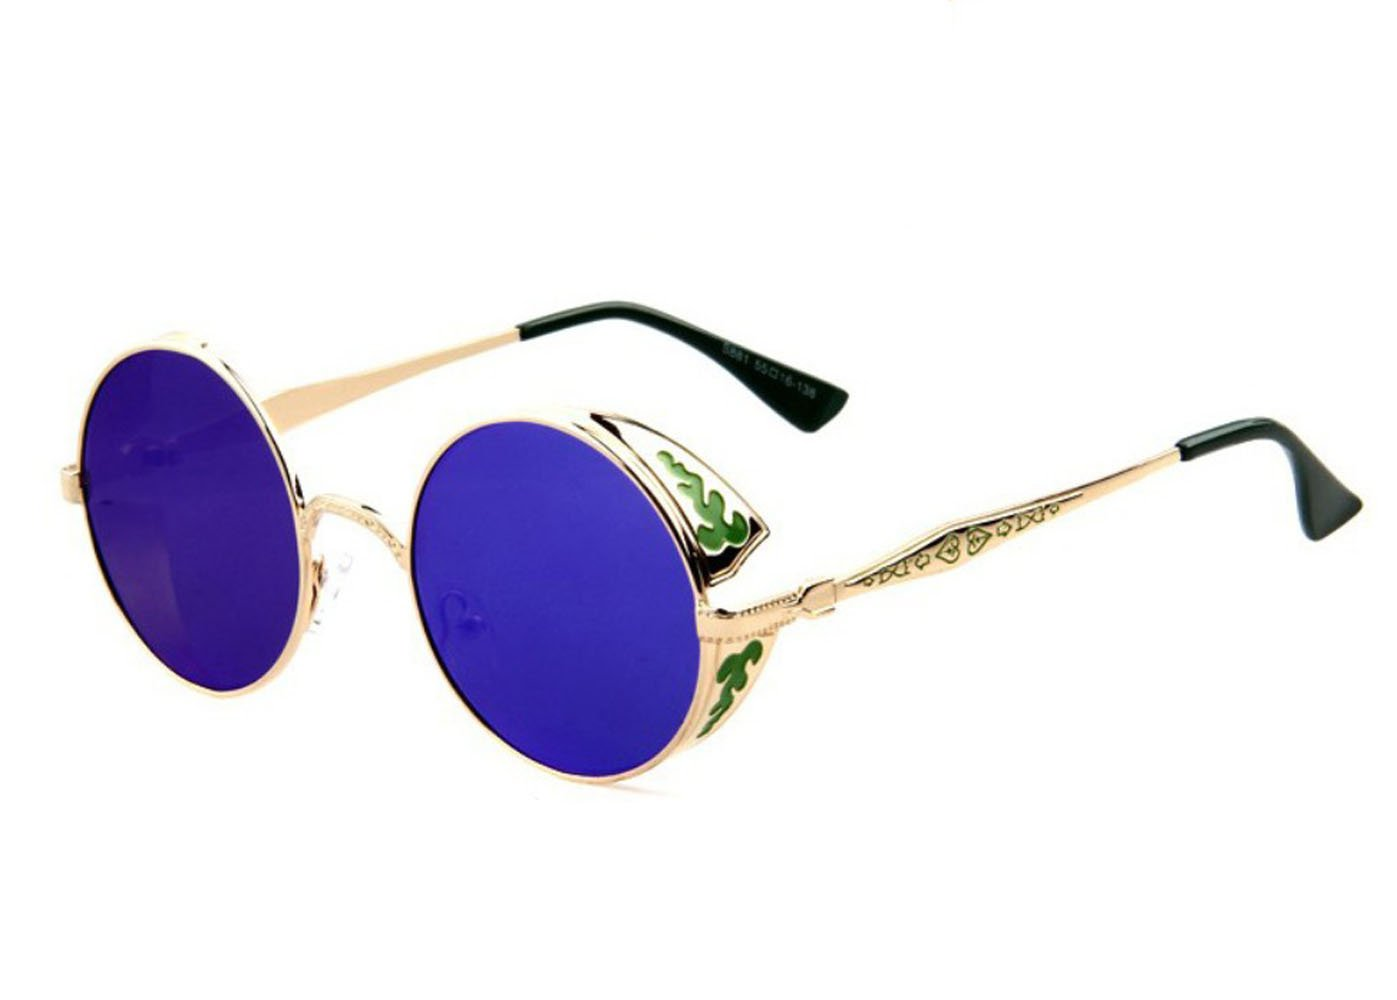 TELAM Telam Sunglasses, Vintage Retro Steampunk Gothic Round Sunglasses. Eyewear